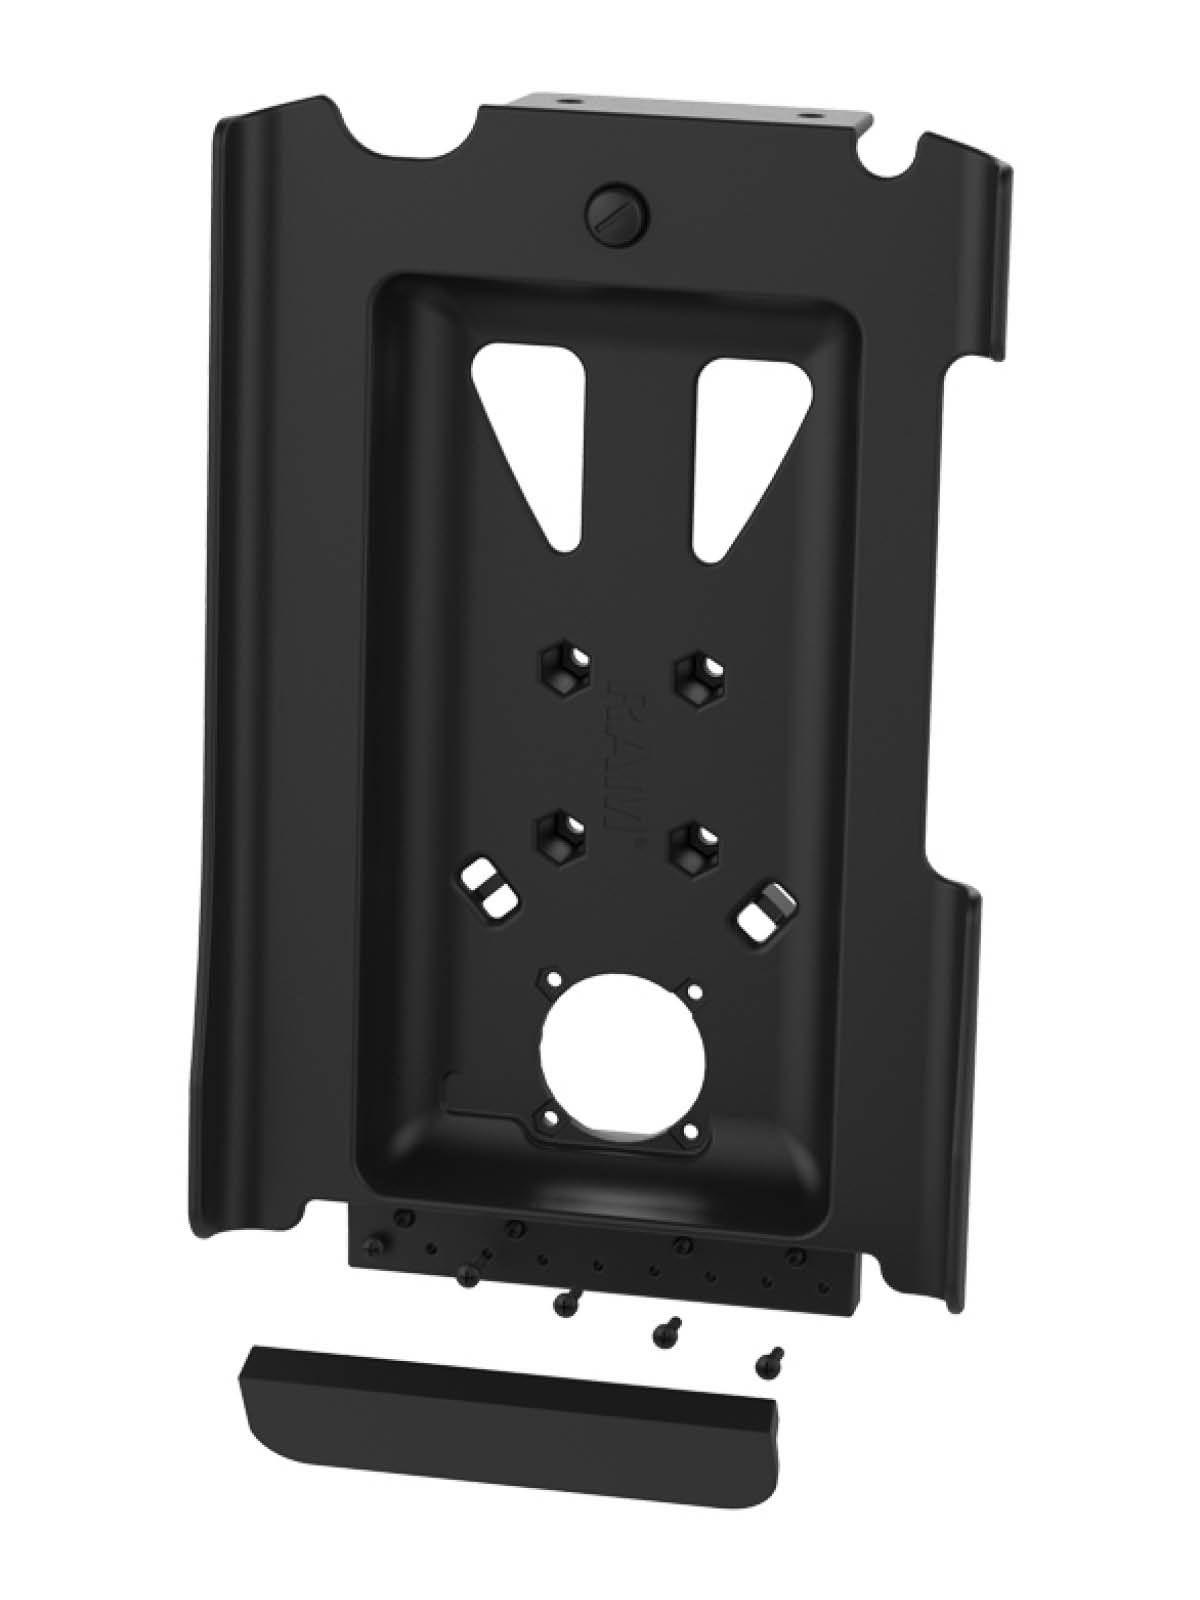 RAM Mounts Tough-Dock Body für Samsung Tab A7 10.4 - GDS kompatibel, AMPS-Aufnahme